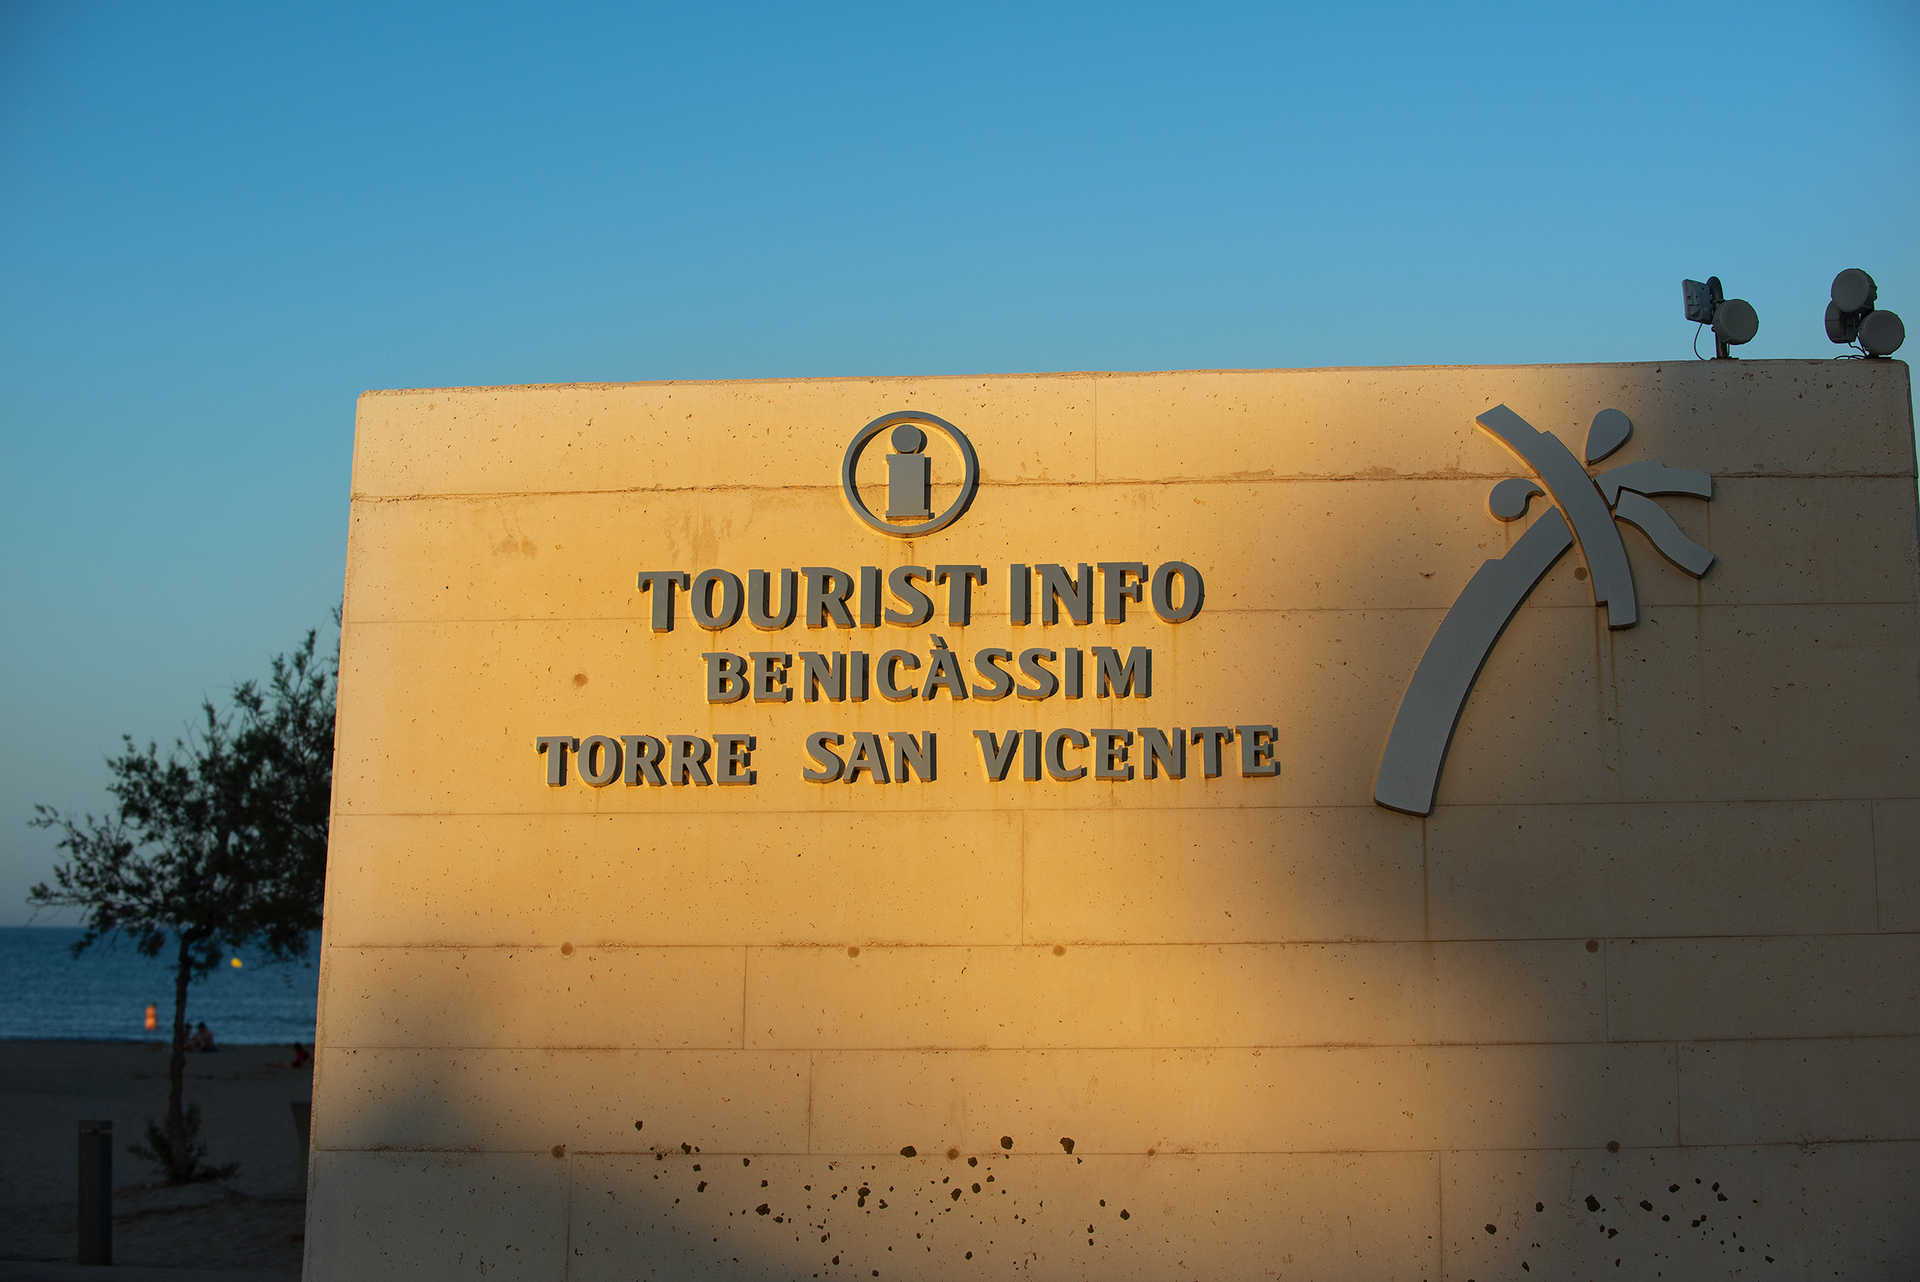 TOURIST INFO BENICÀSSIM - TORRE SAN VICENTE